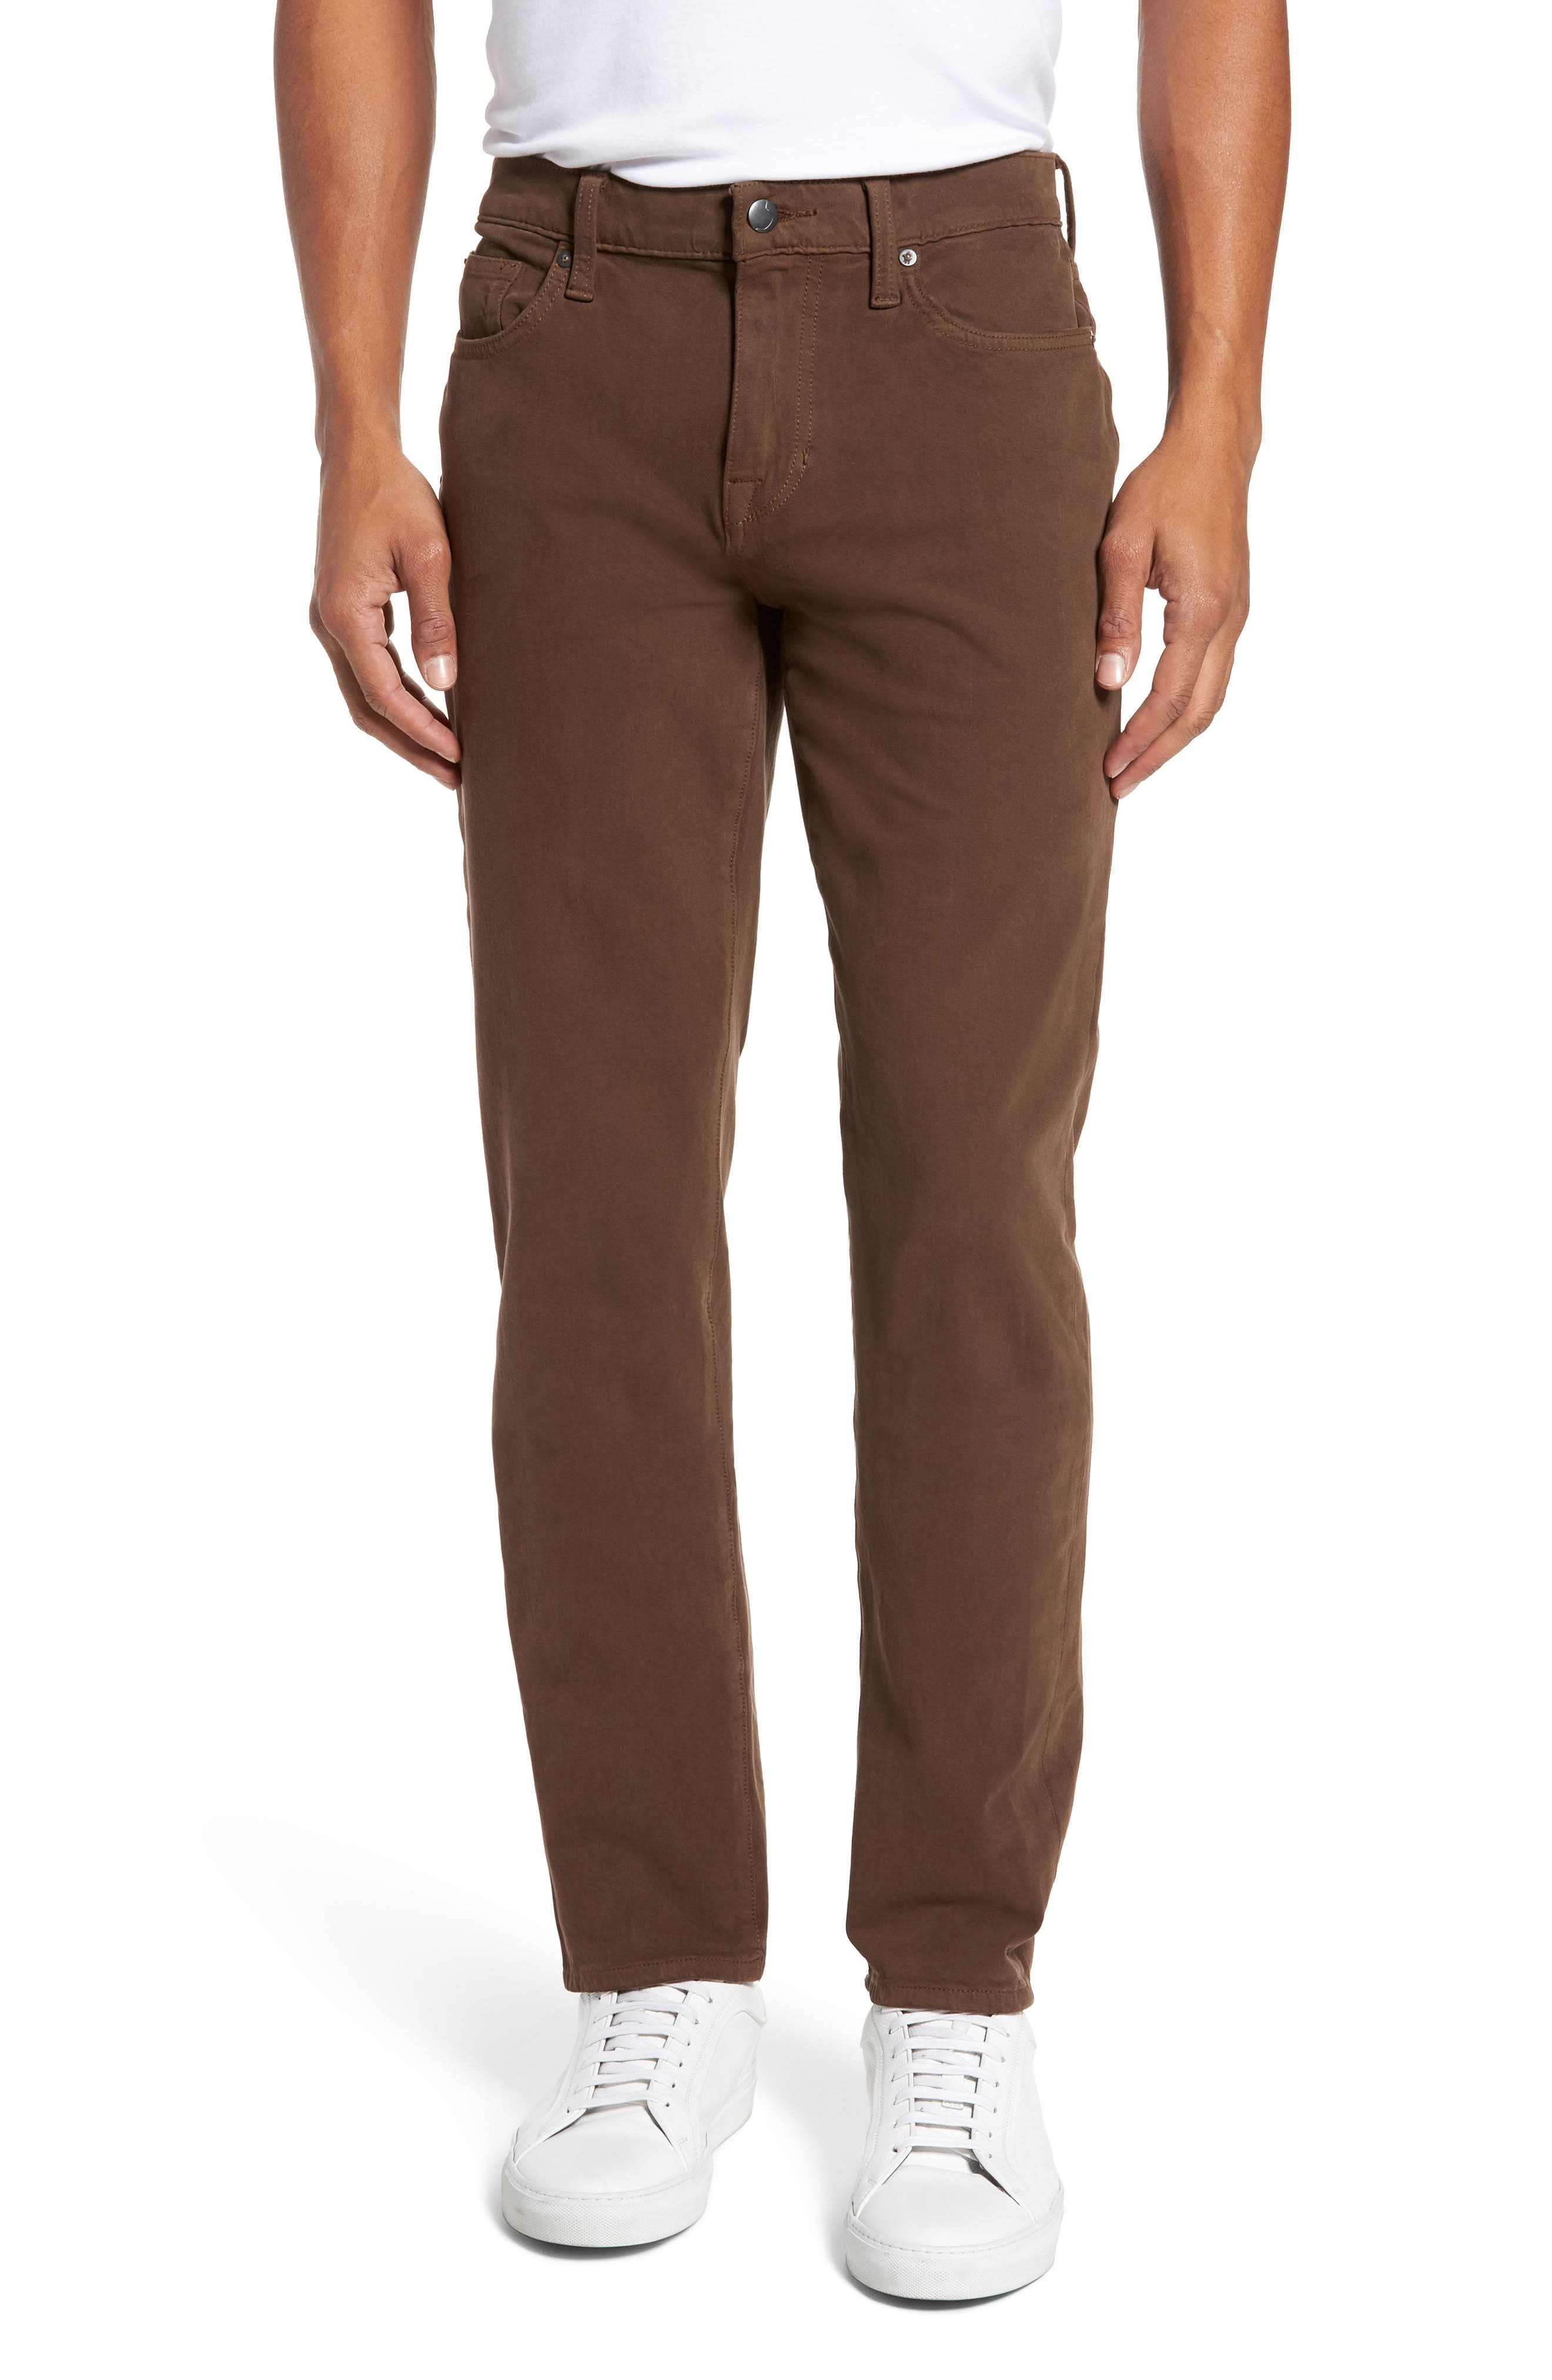 Brixton Slim Straight Fit Jeans,                             Main thumbnail 1, color,                             202